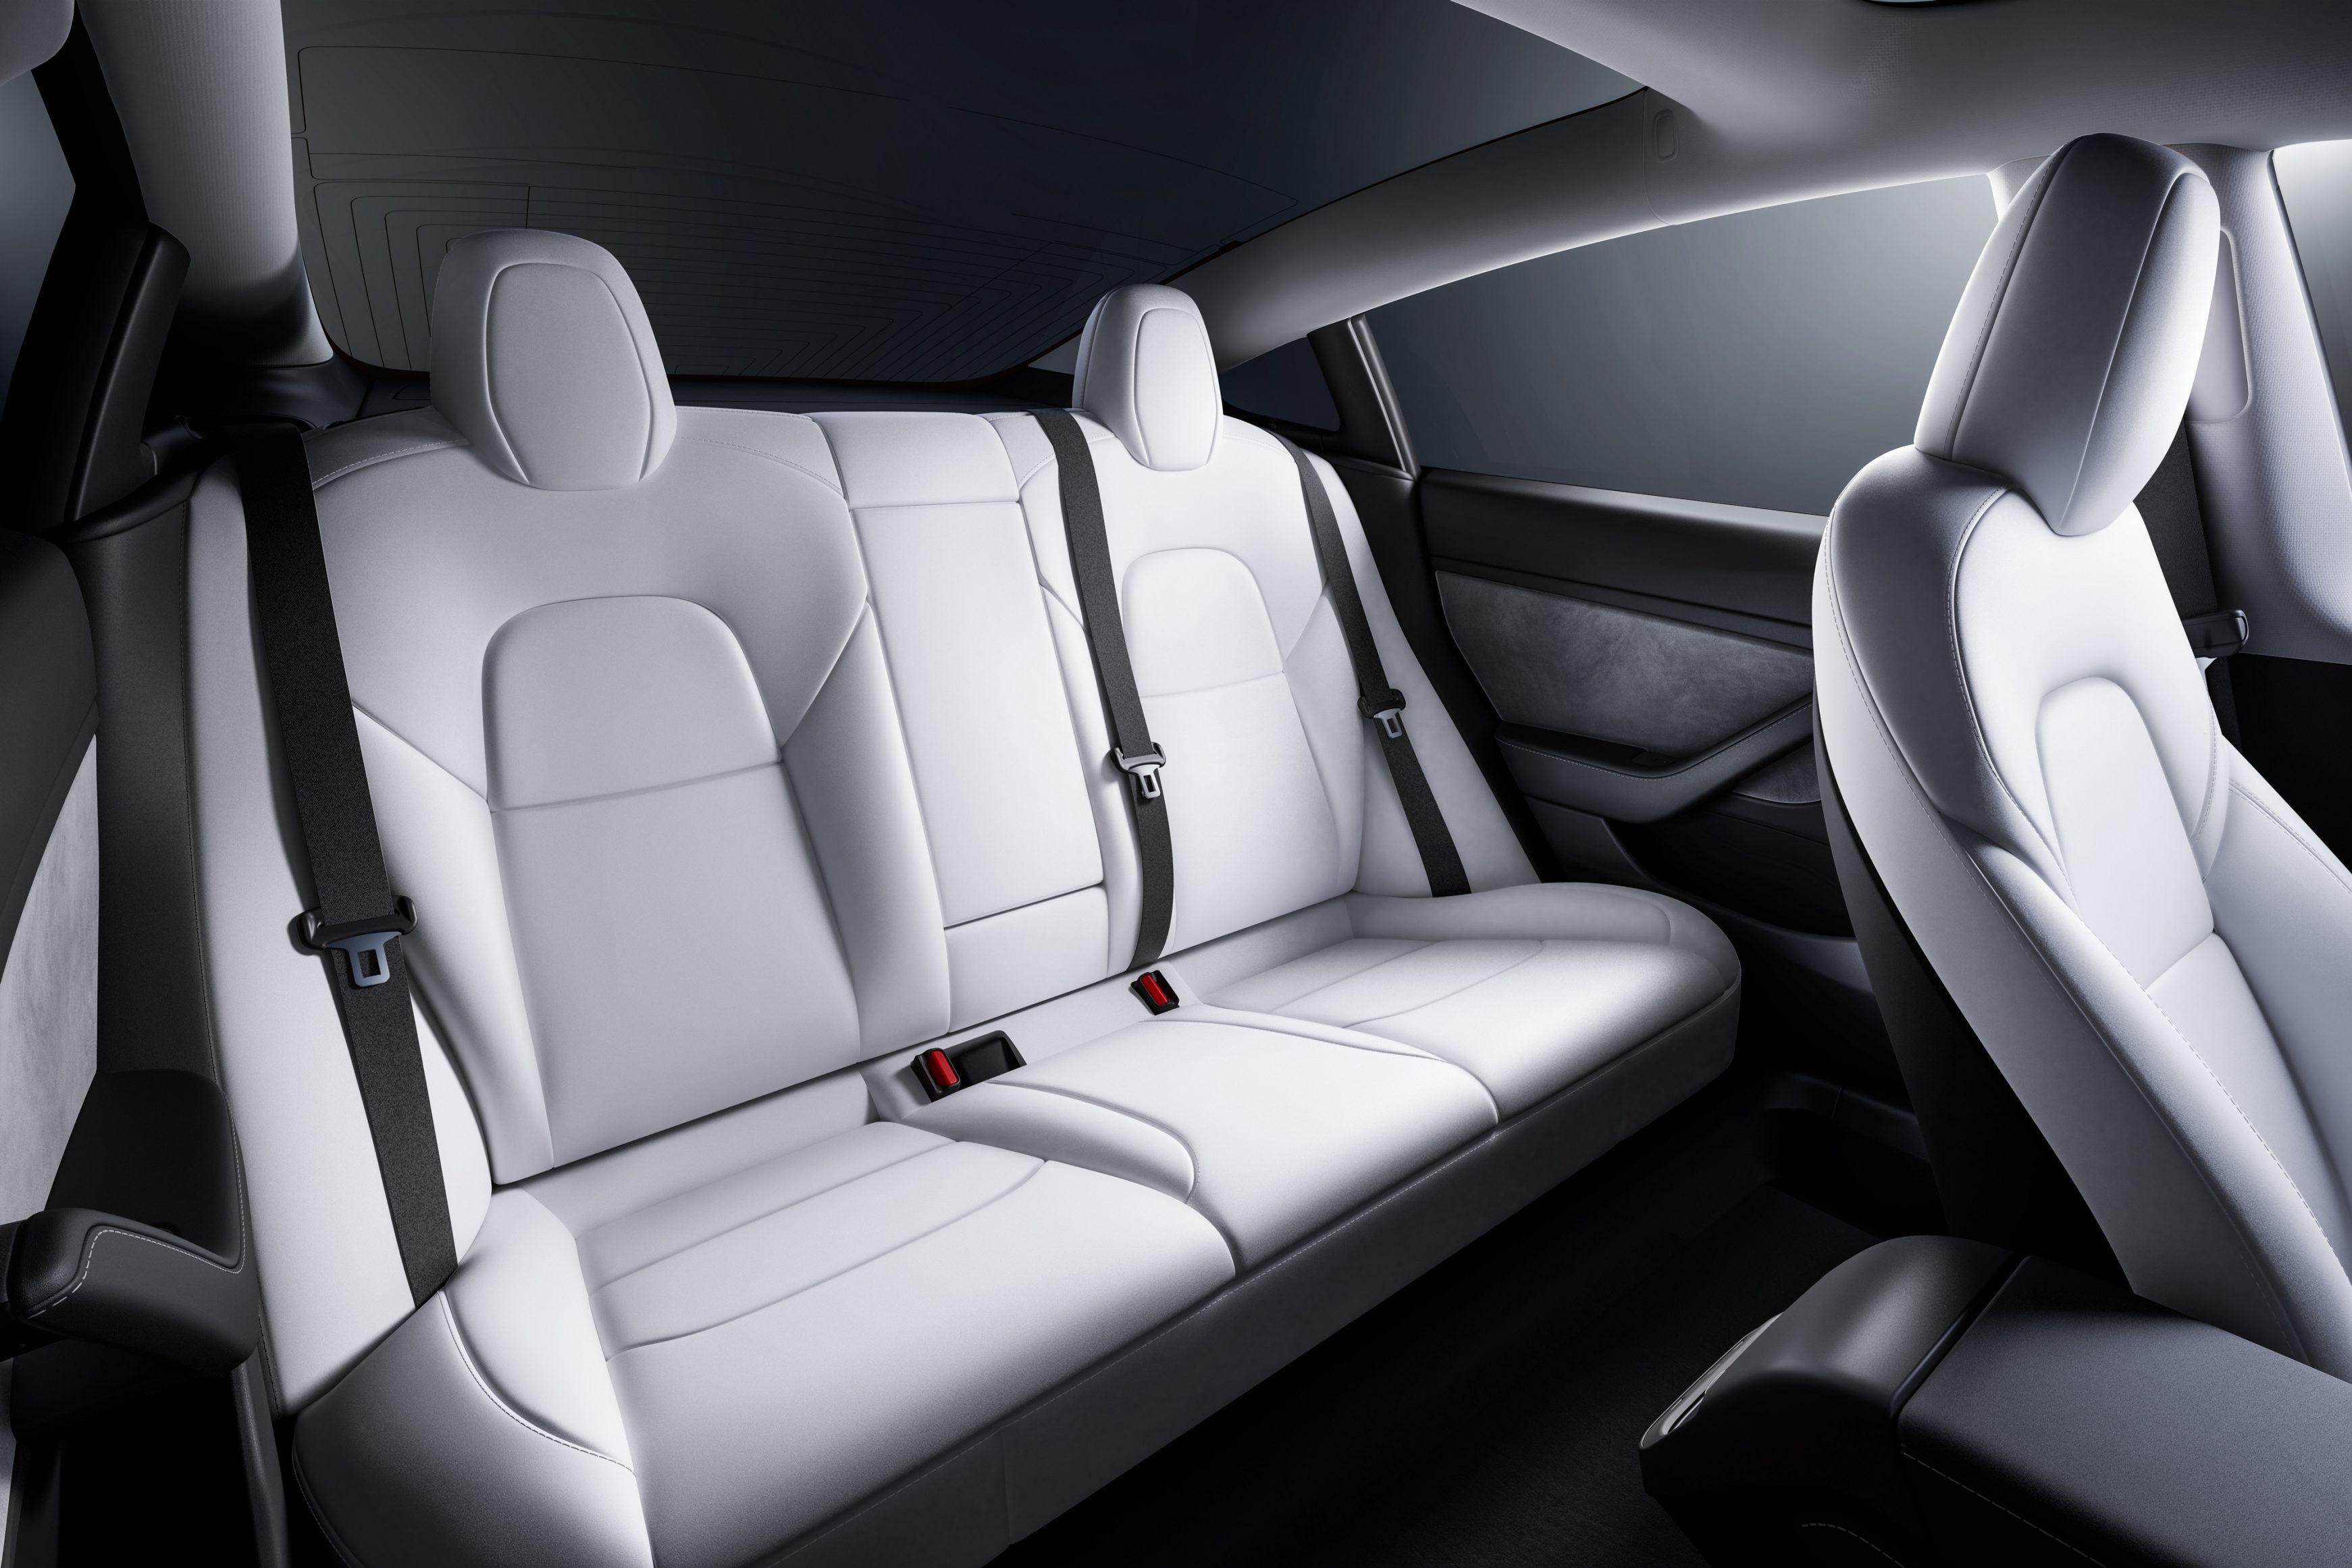 2021 Tesla Model 3 back seats